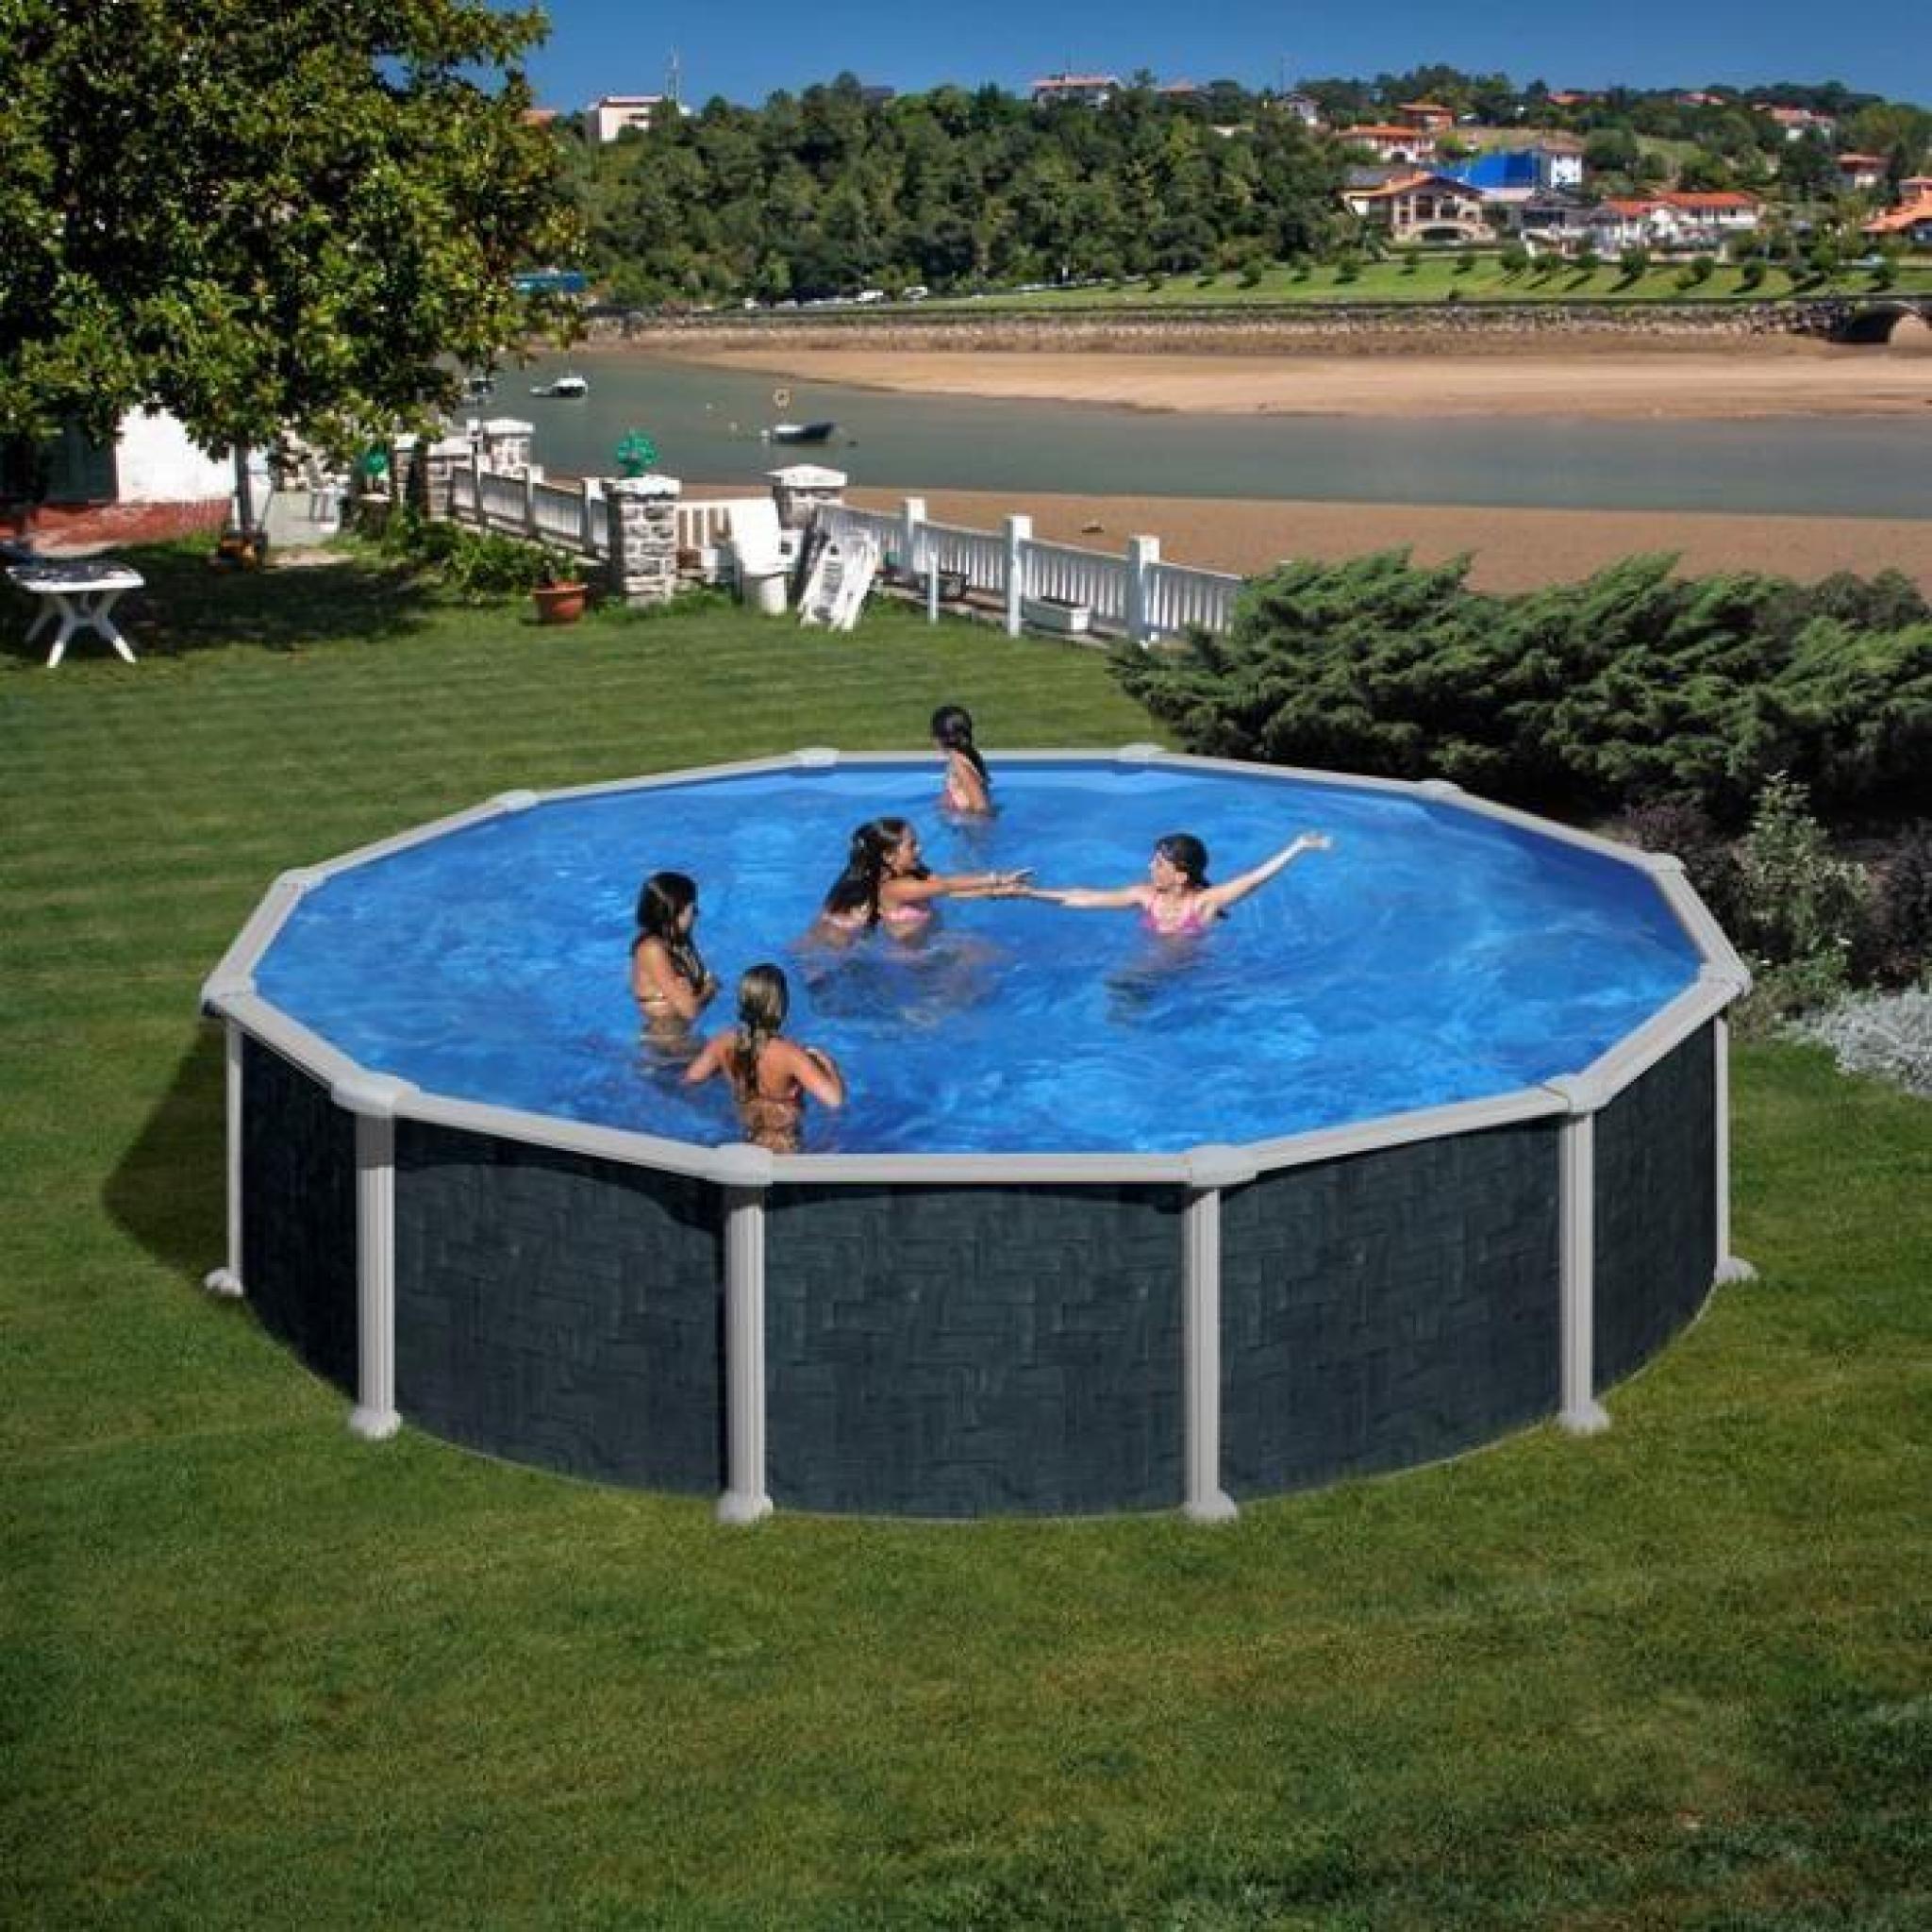 piscine hors sol acier aspect rotin alto ronde diam 4. Black Bedroom Furniture Sets. Home Design Ideas